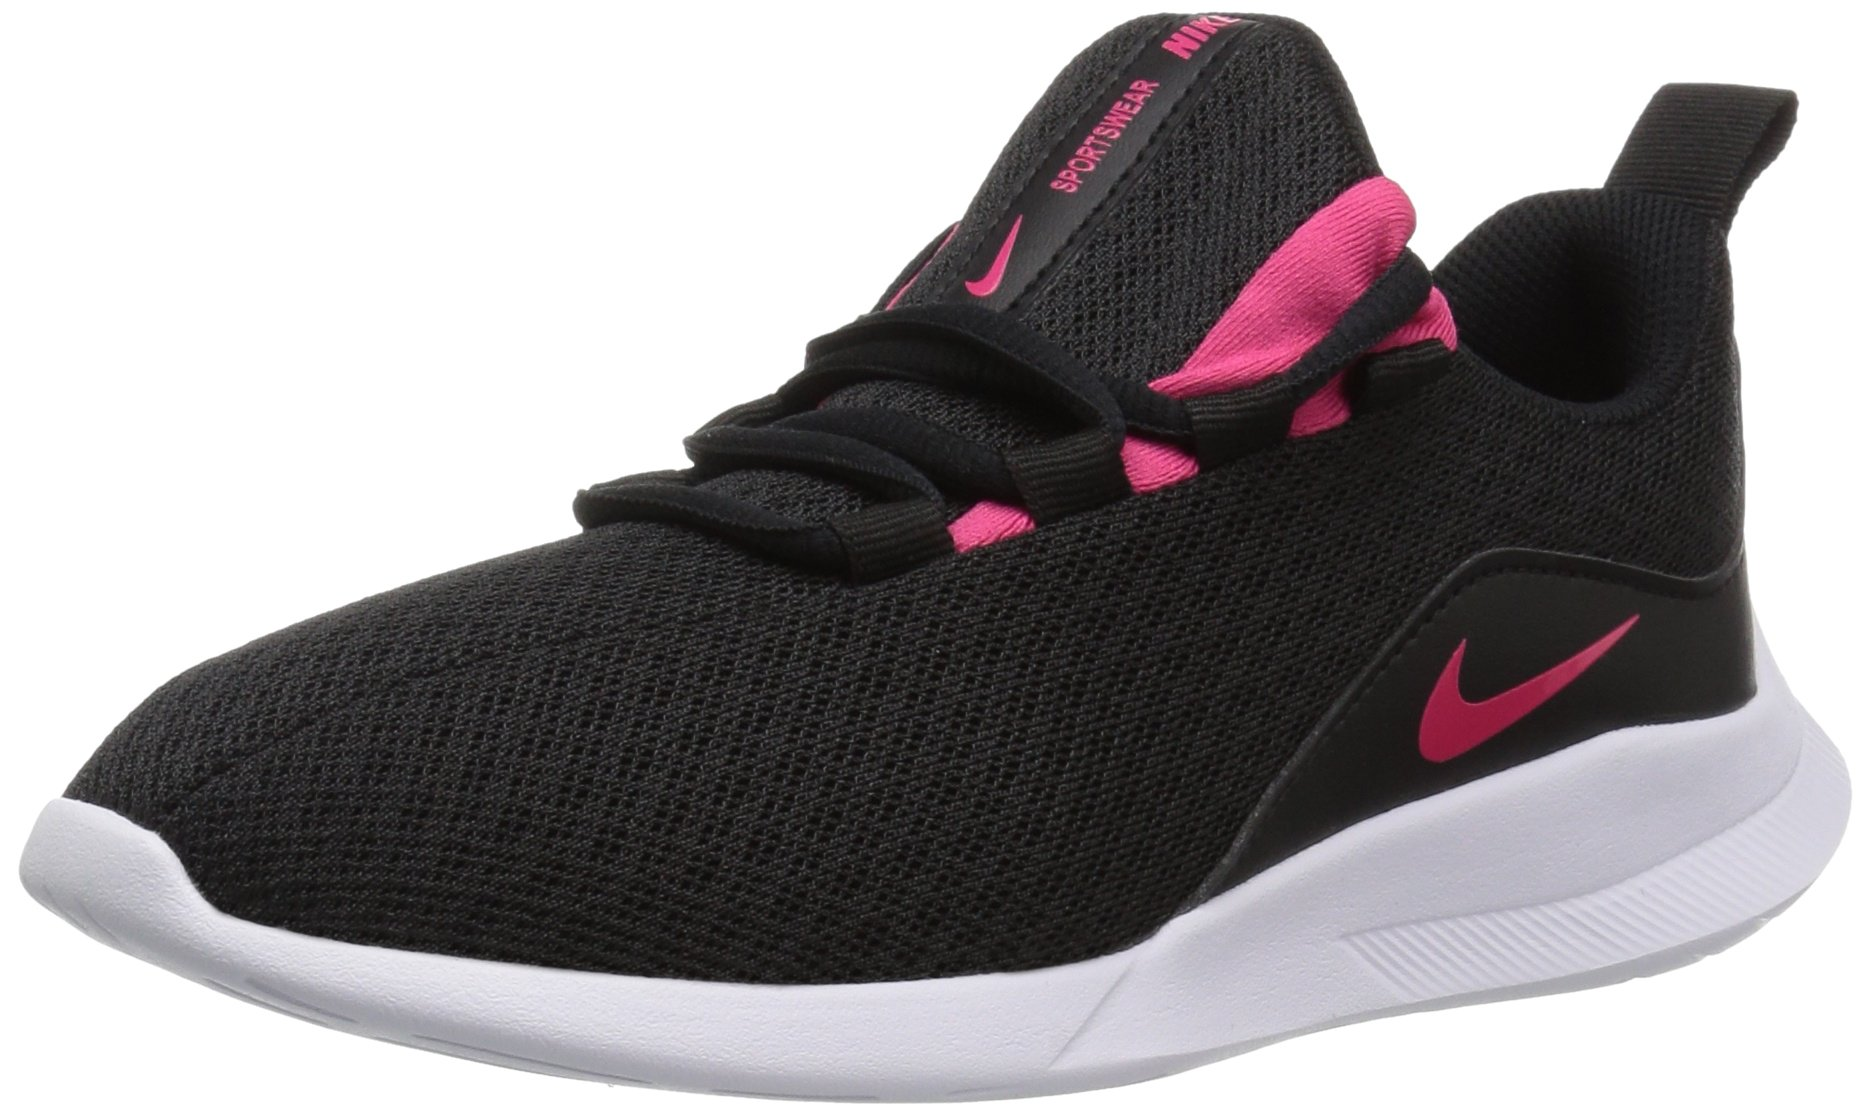 Nike Girls' Viale (GS) Running Shoe Black/Rush Pink-White 4.5Y Youth US Big Kid by Nike (Image #1)